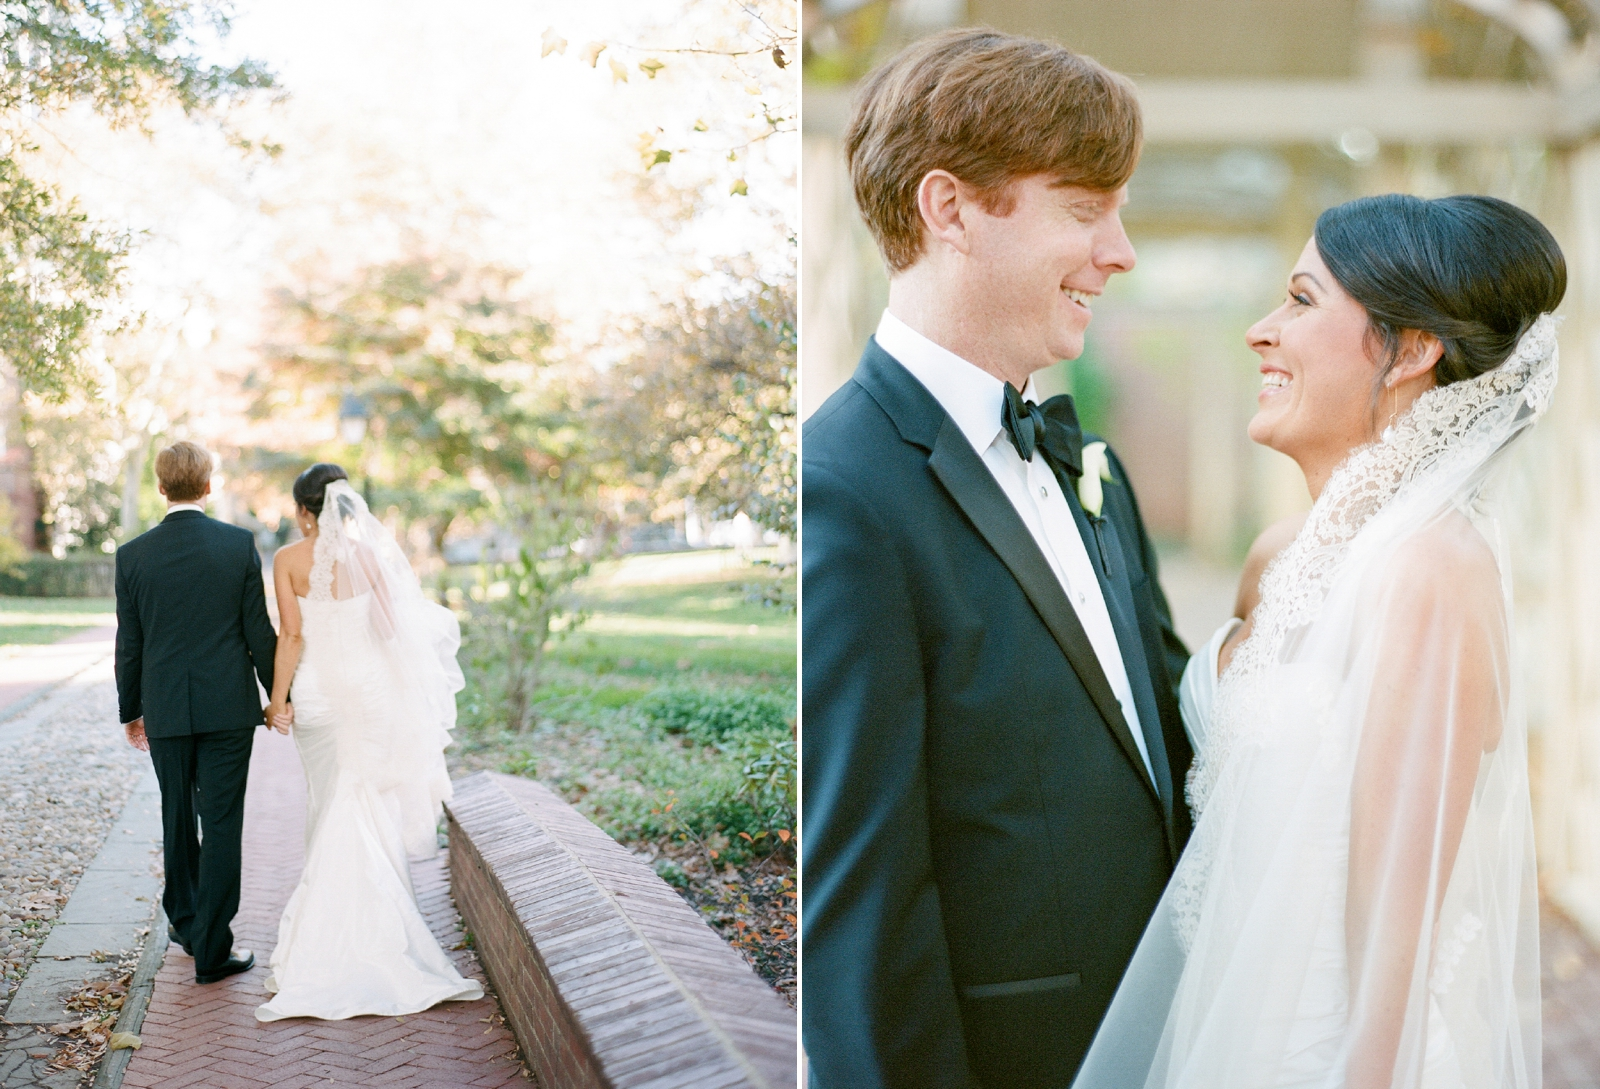 atrium at curtis center wedding photographer philadelphia wedding photographer shannon griffin_0074.jpg